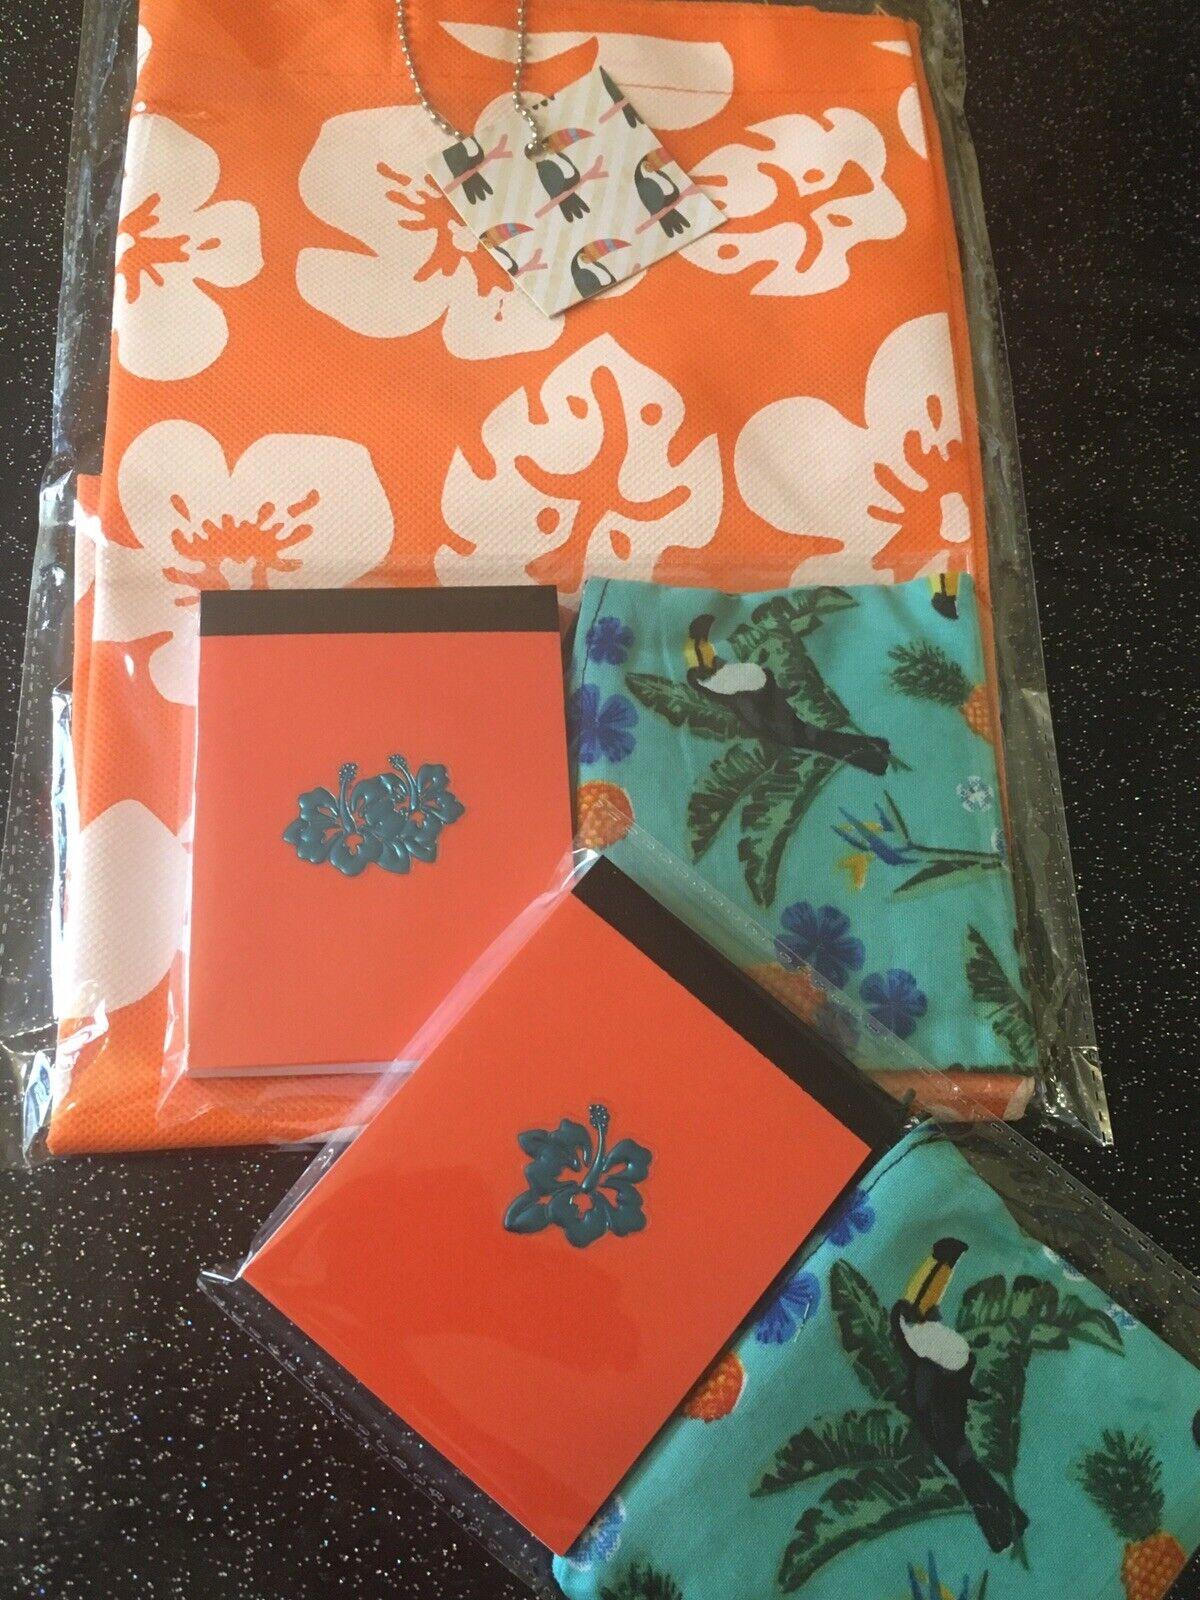 Tropical Orange Hibiscus 🌺Tote Bag +Notebook +Palm Tree Toucan Purse 3pc Set